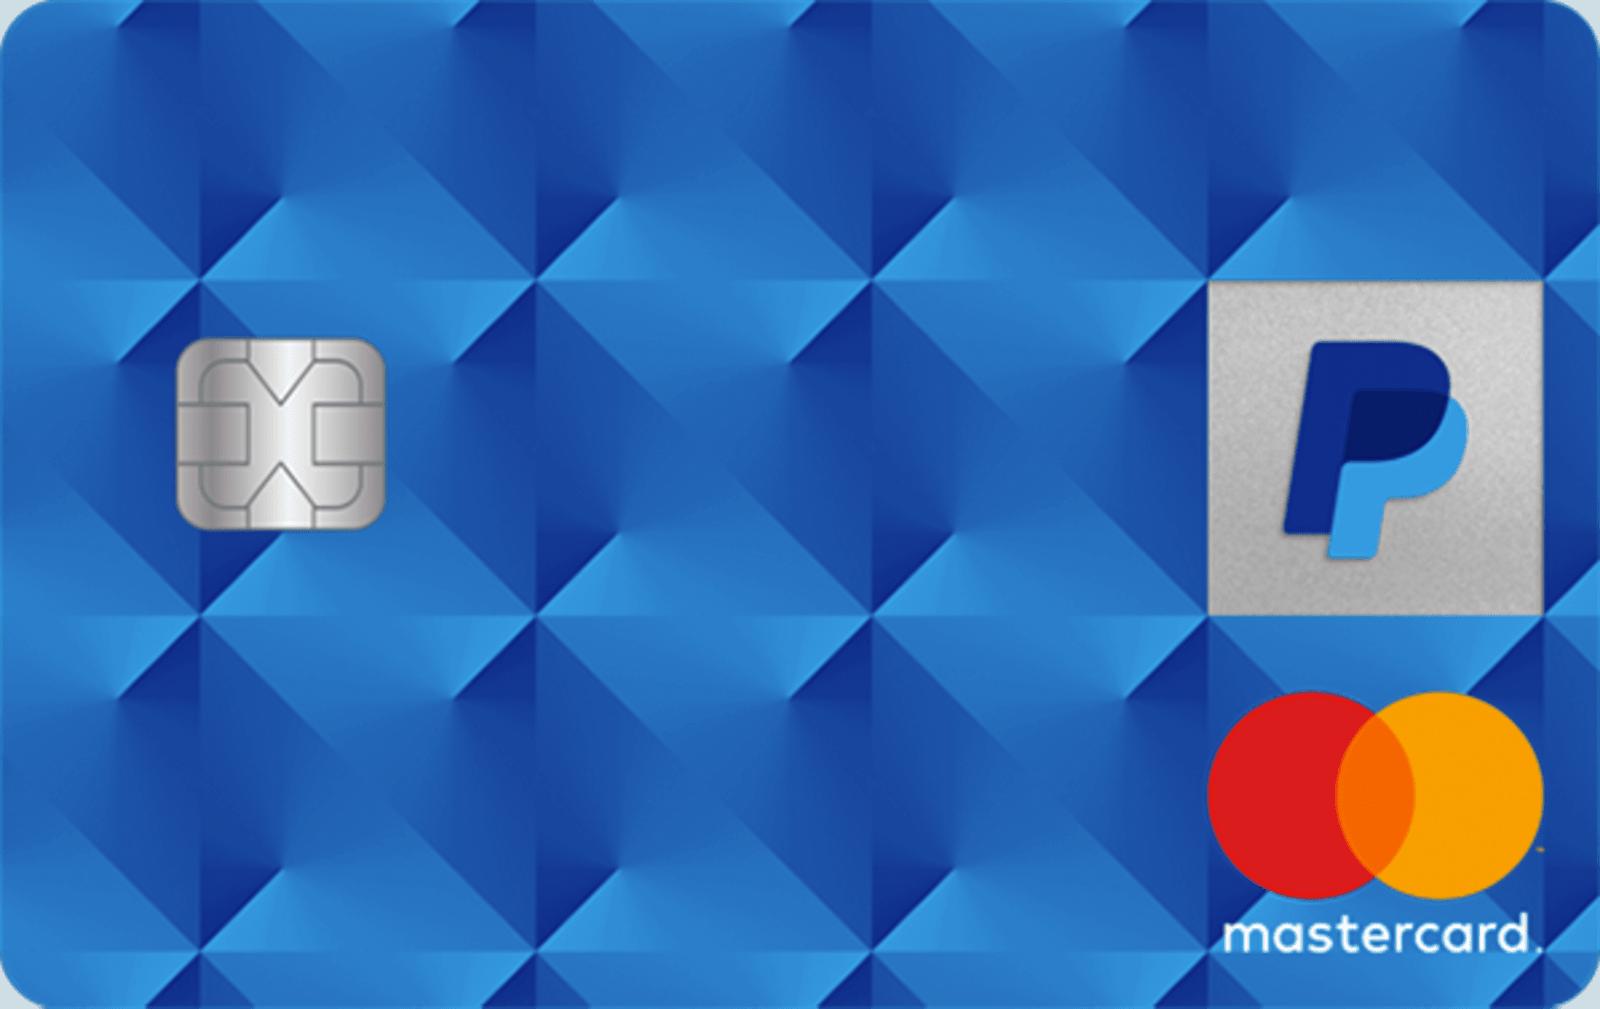 PayPal Cashback Mastercard®: Should You Apply? | Credit Card